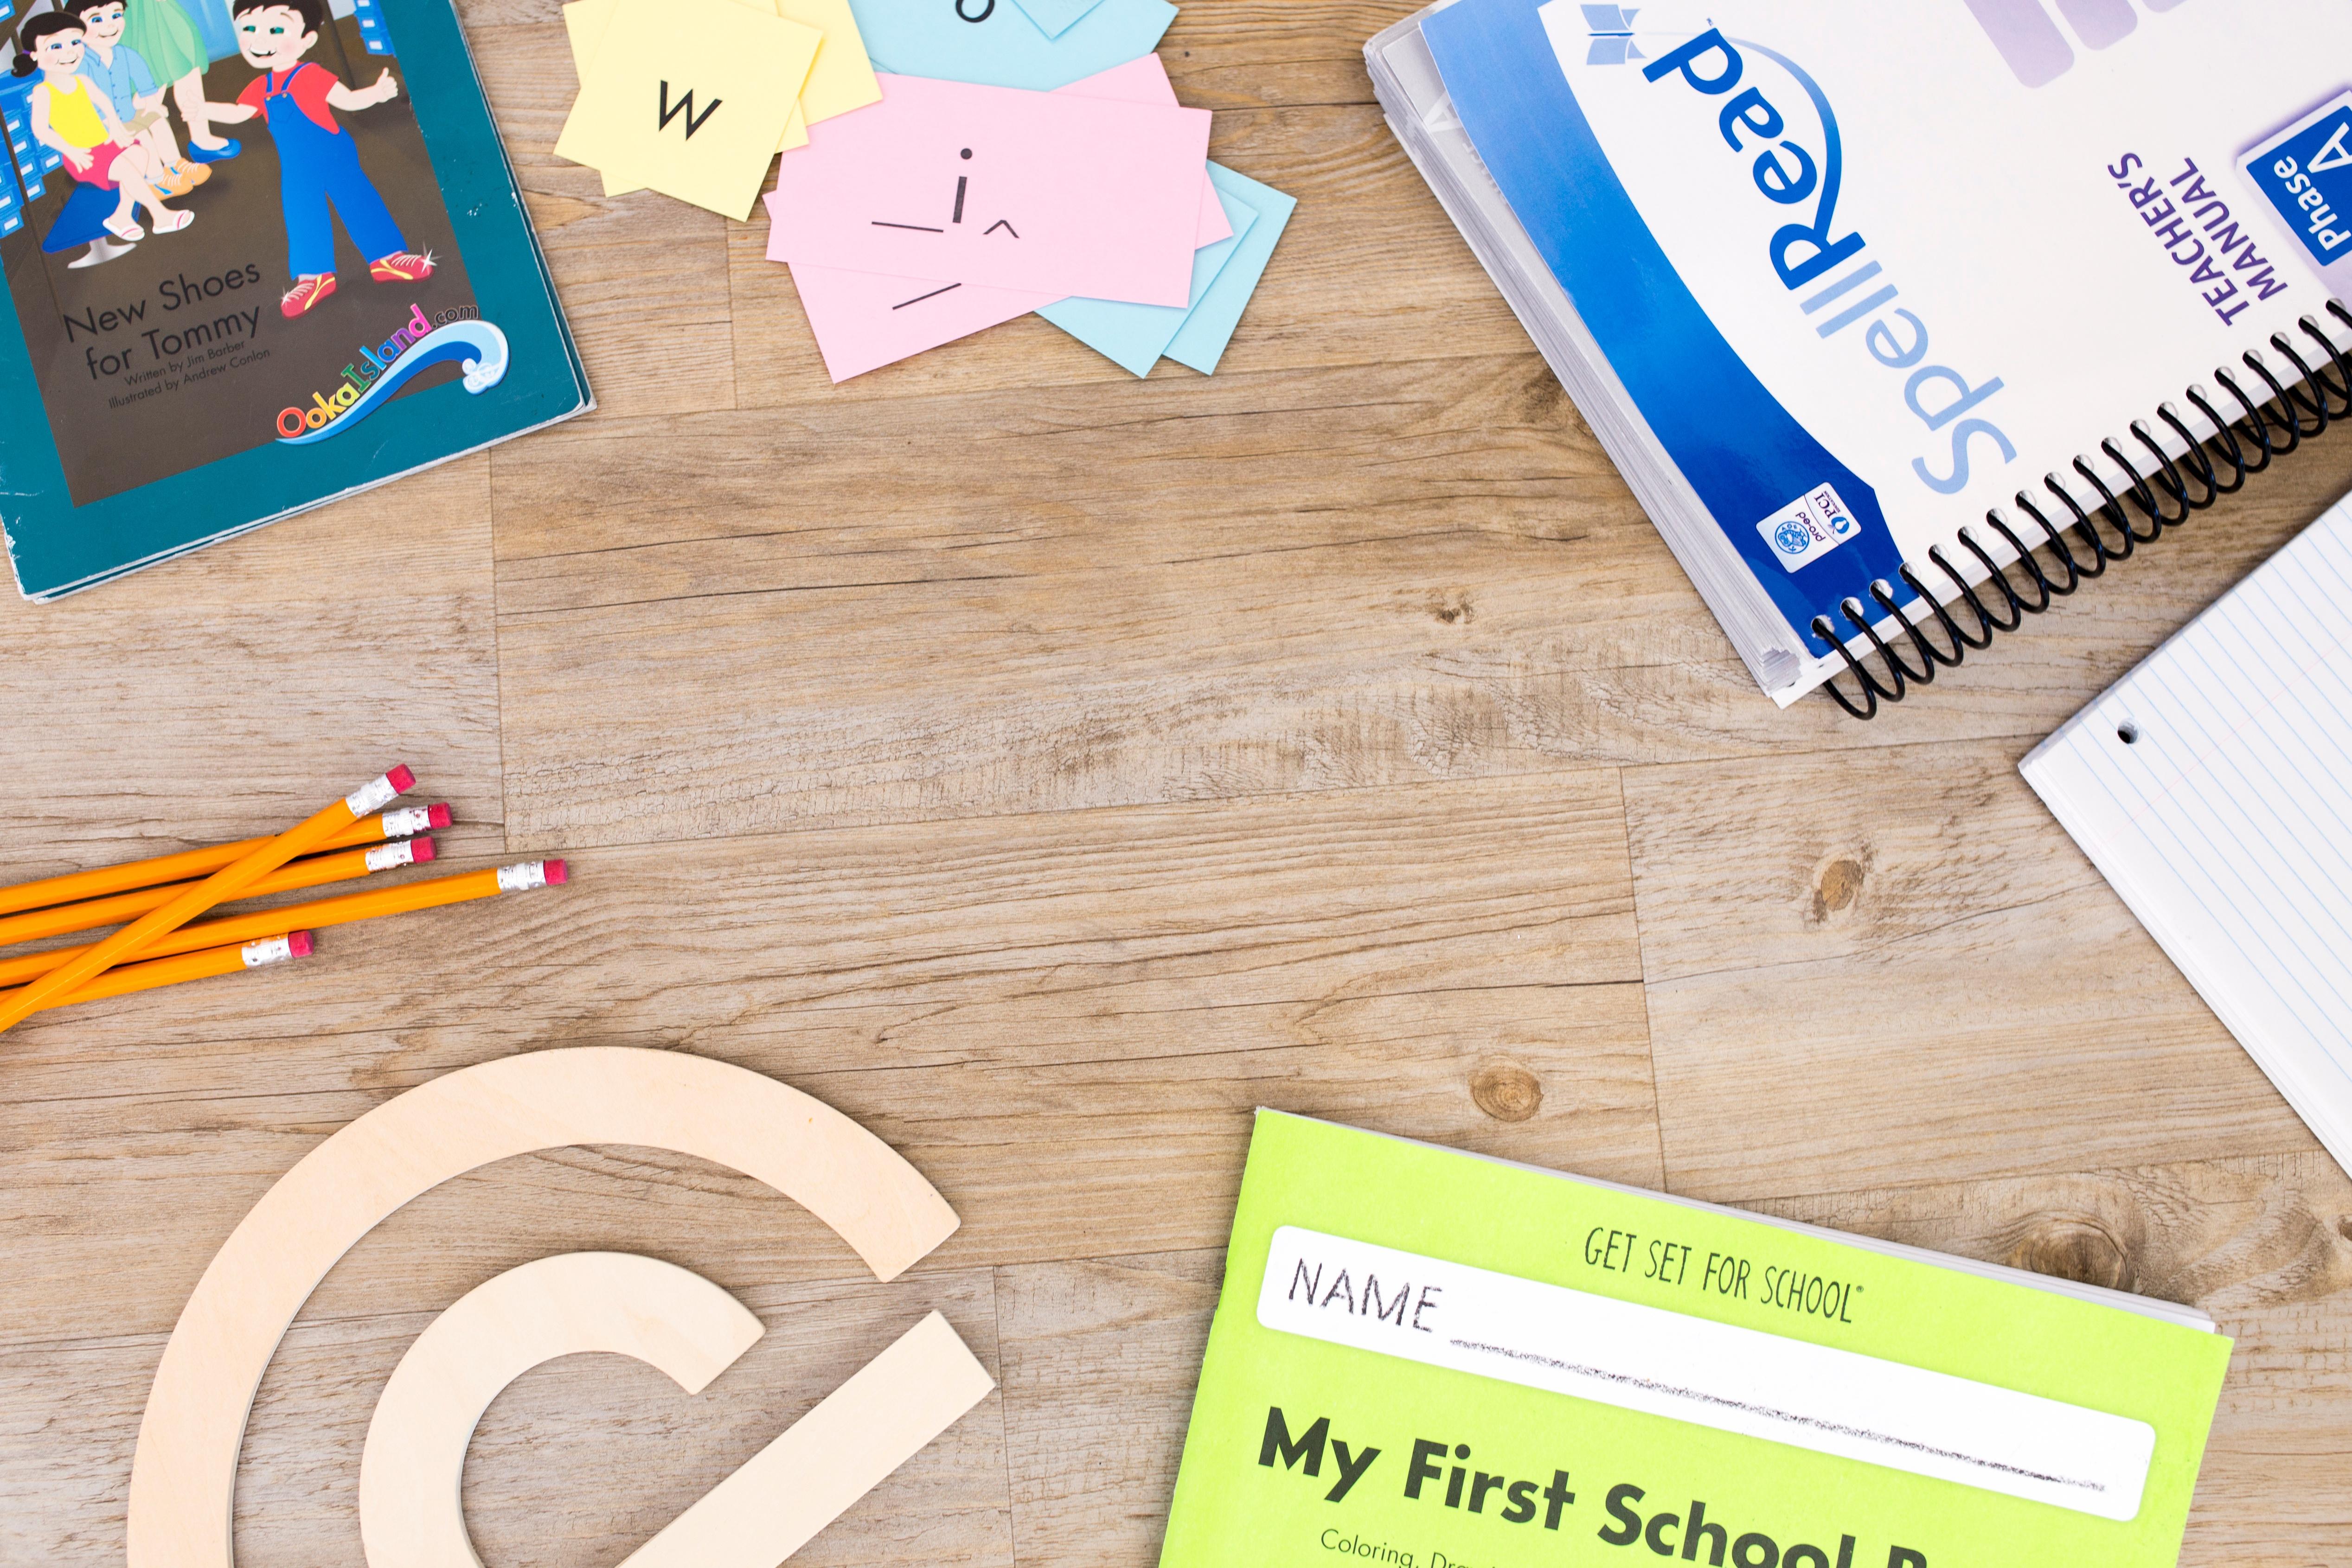 halifax learning read write spell reading program reading support tutor tutoring evidence-based